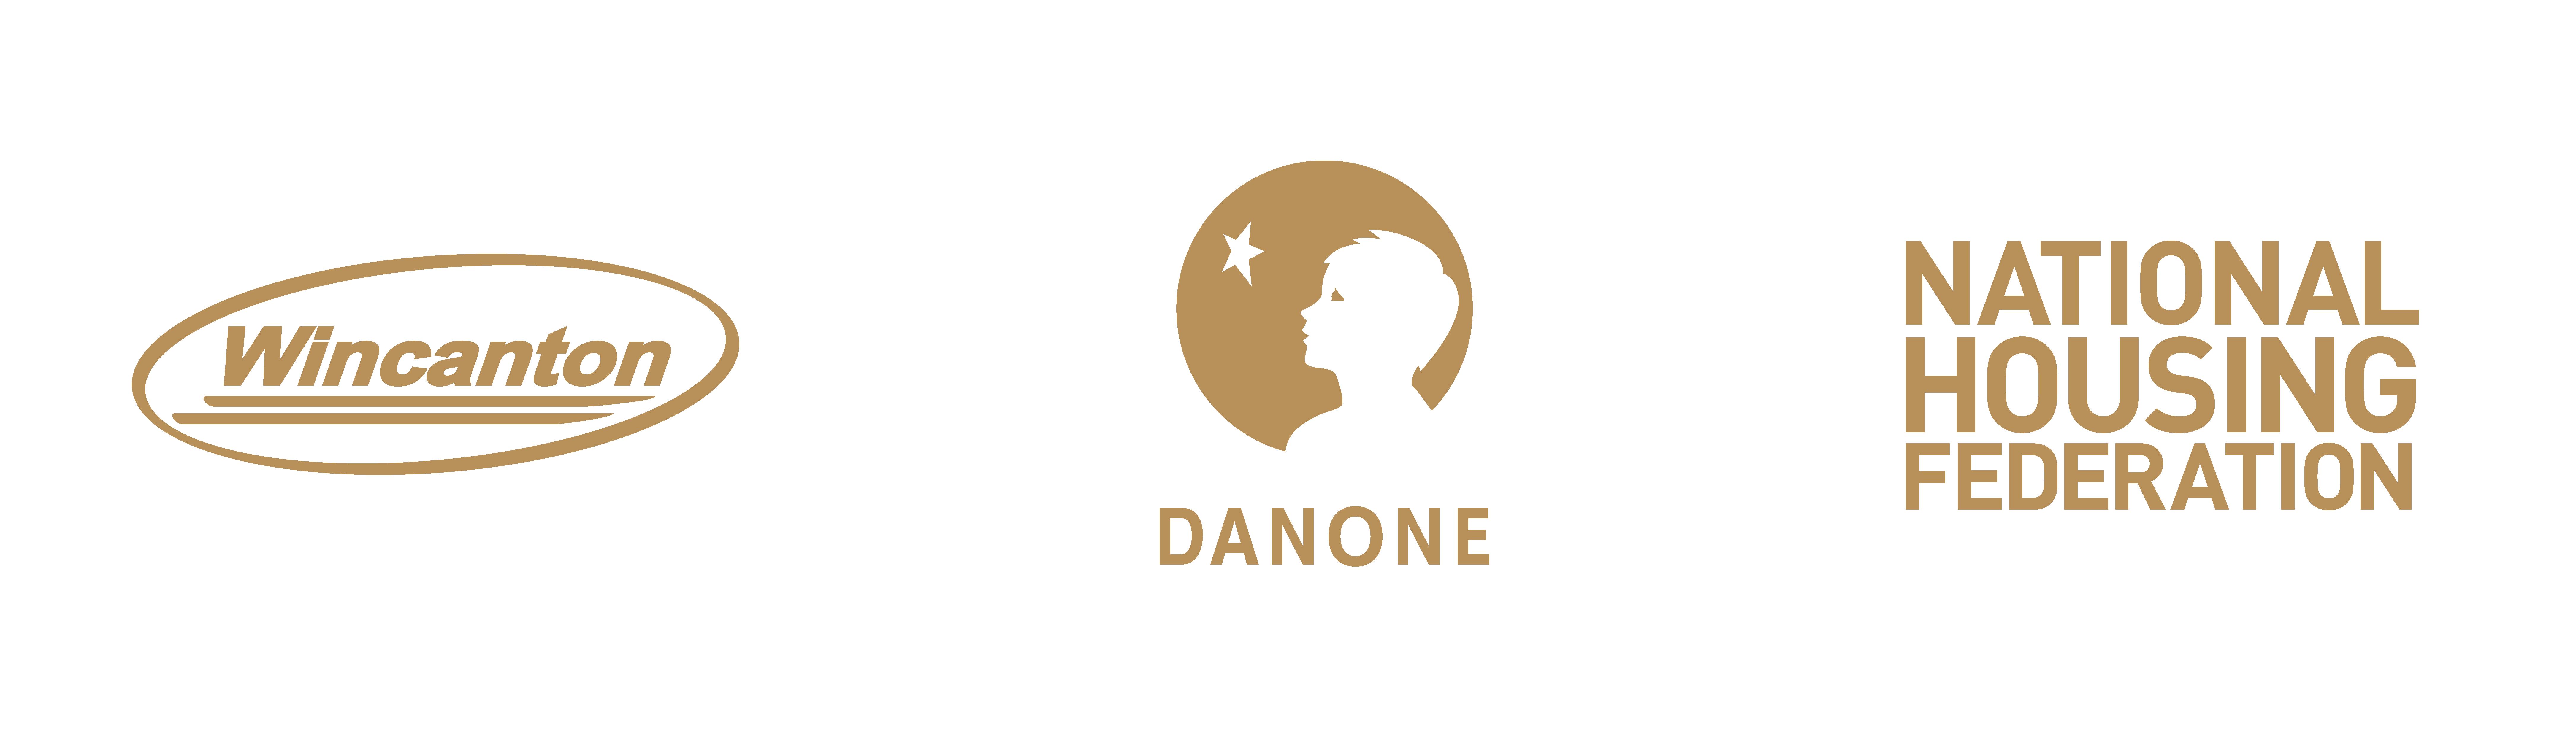 wincanton-danone-nation housing federation